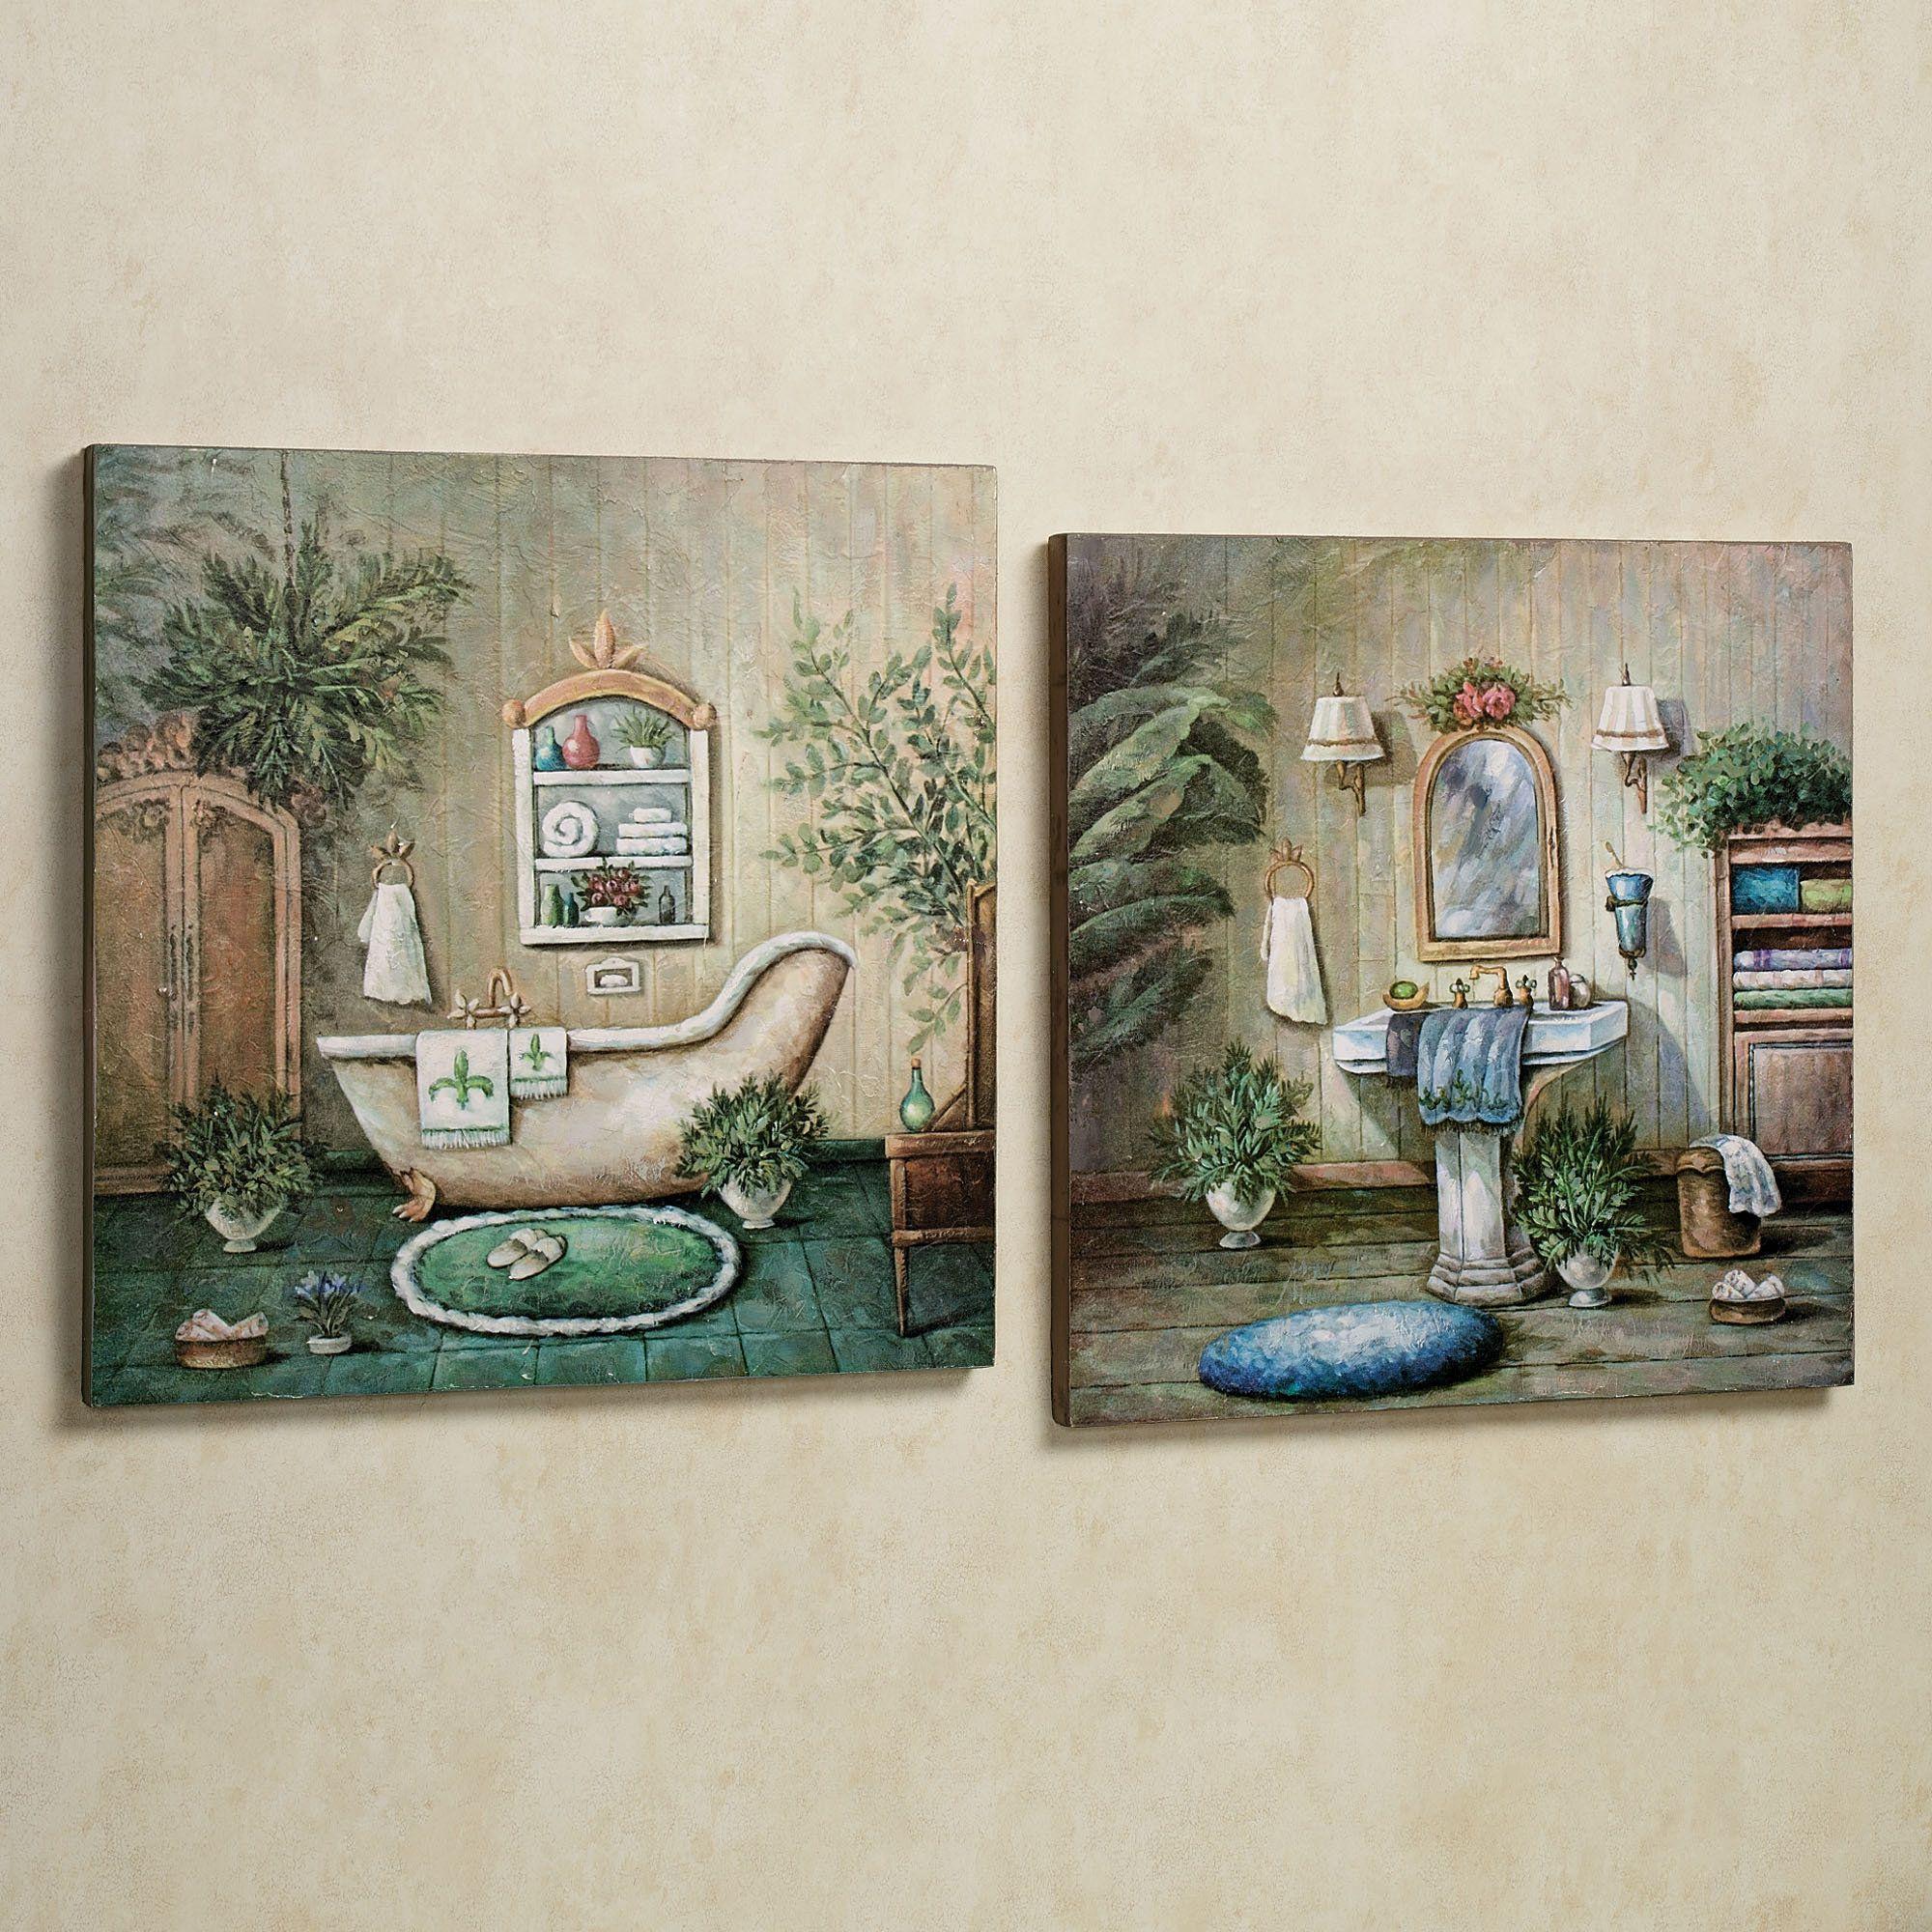 Blissful Bath Wooden Wall Art Plaque Set in 2019  Wall Decor  Bathroom wall decor Painting